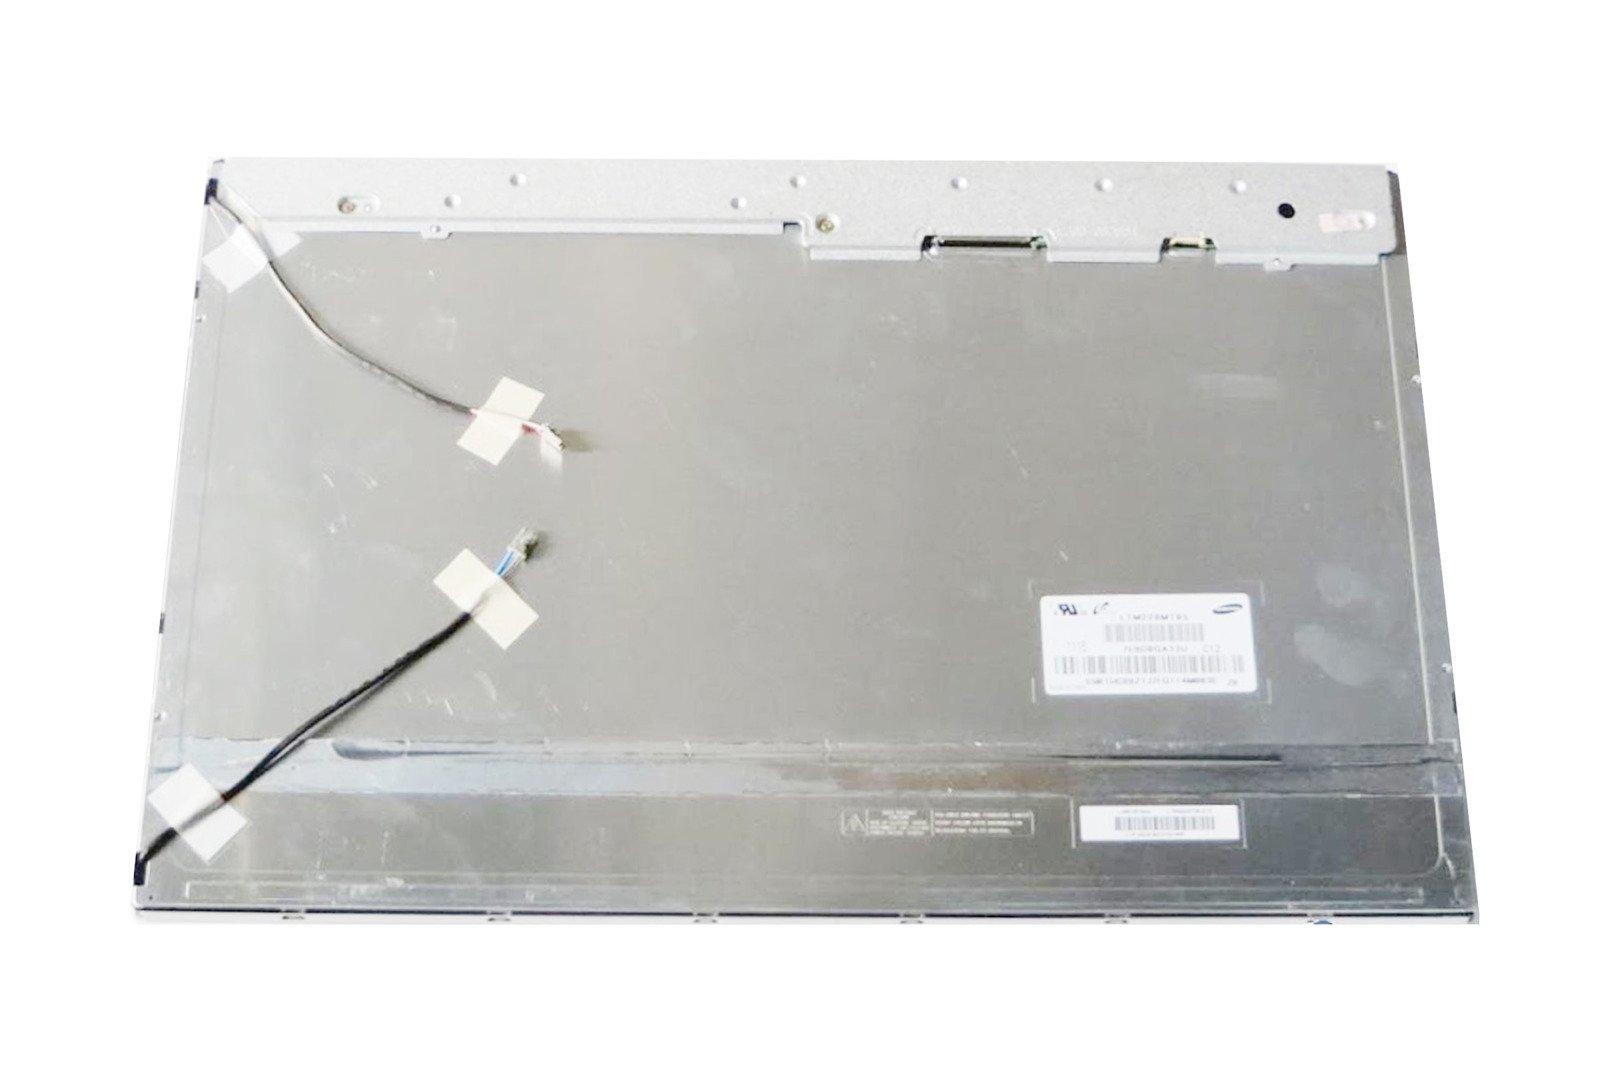 Bildschirm Display Samsung 22' LTM220MT05 1680 x 1050